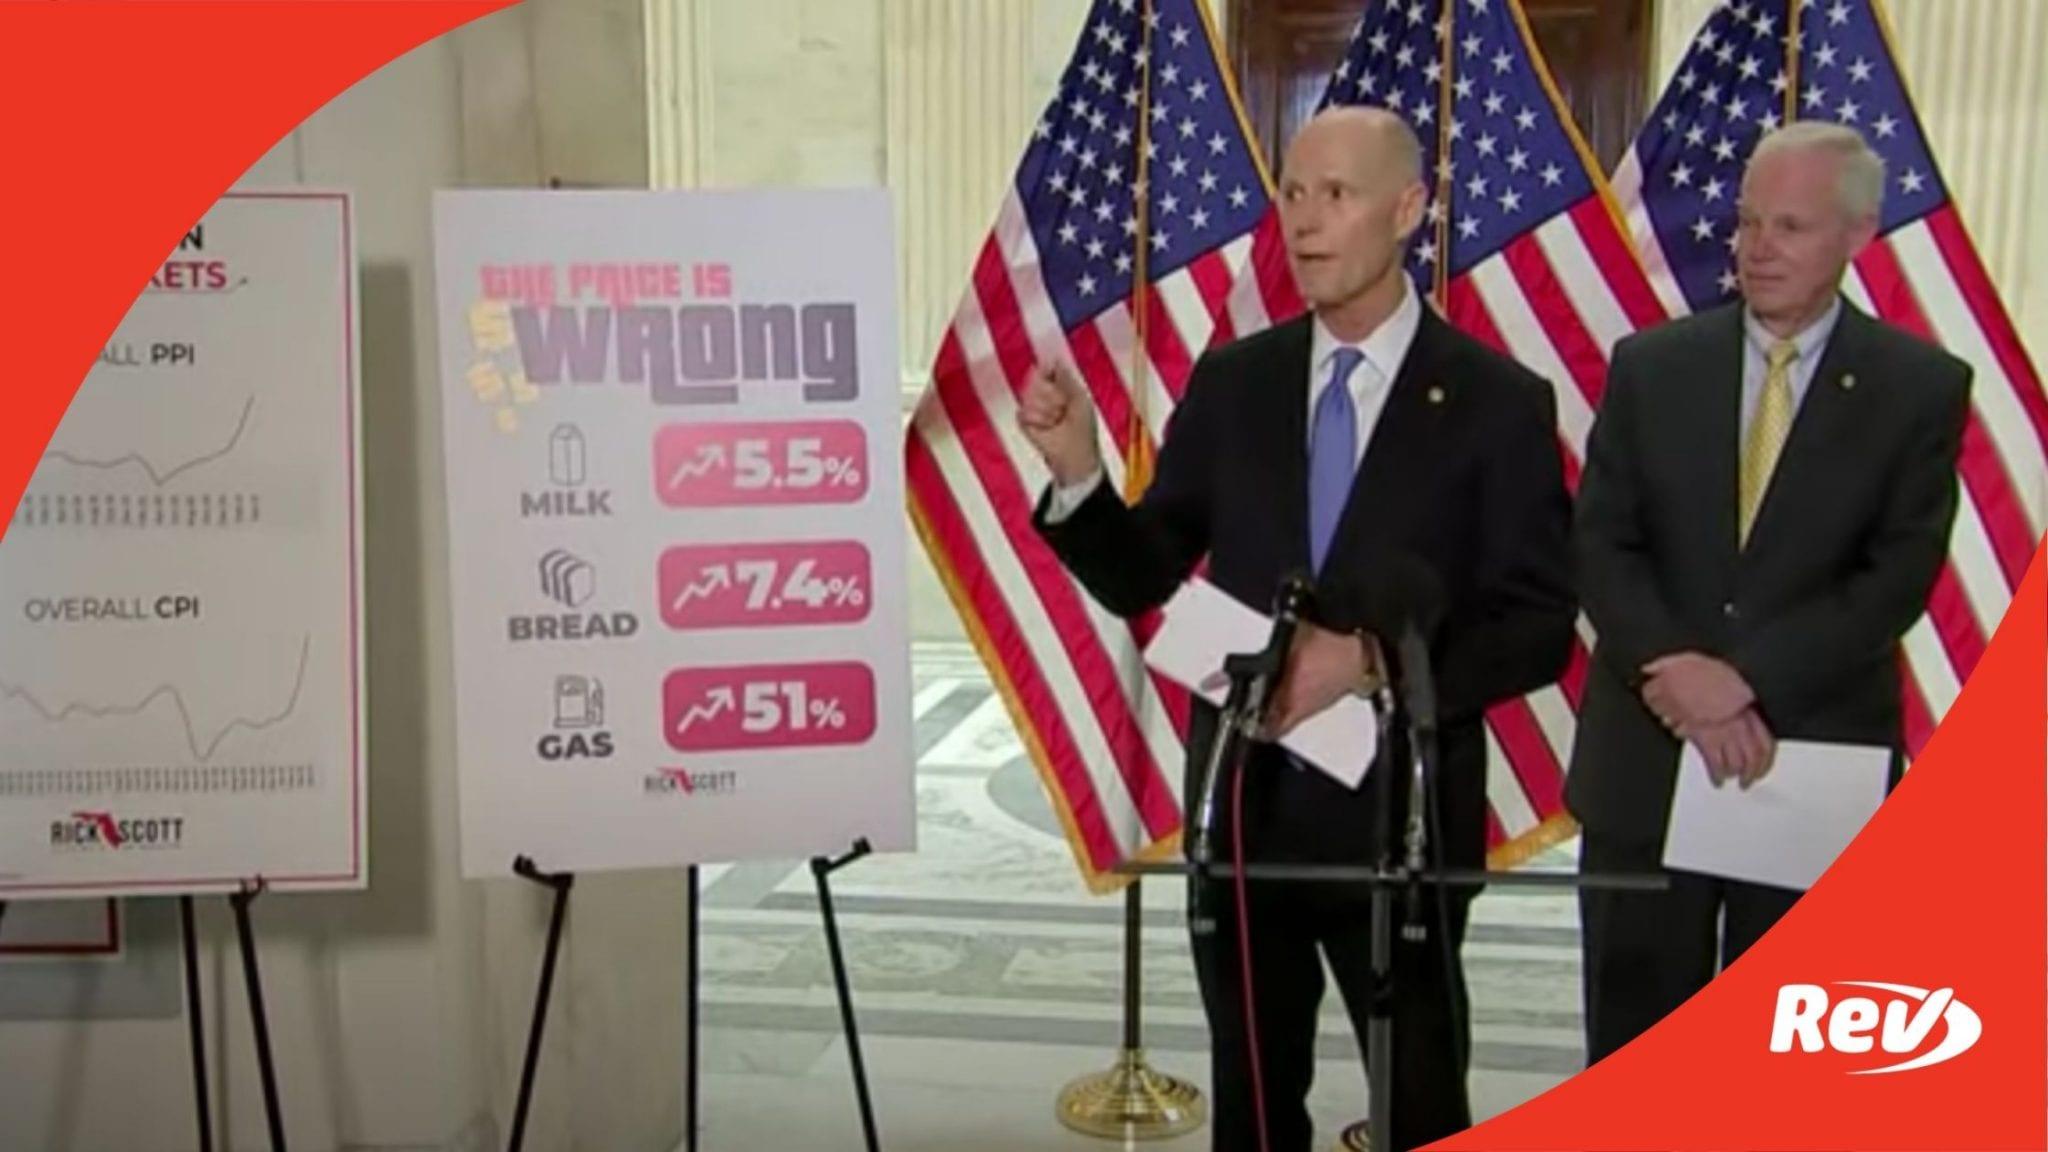 Senate Republicans Press Conference on Inflation, Biden's Legislation Transcript